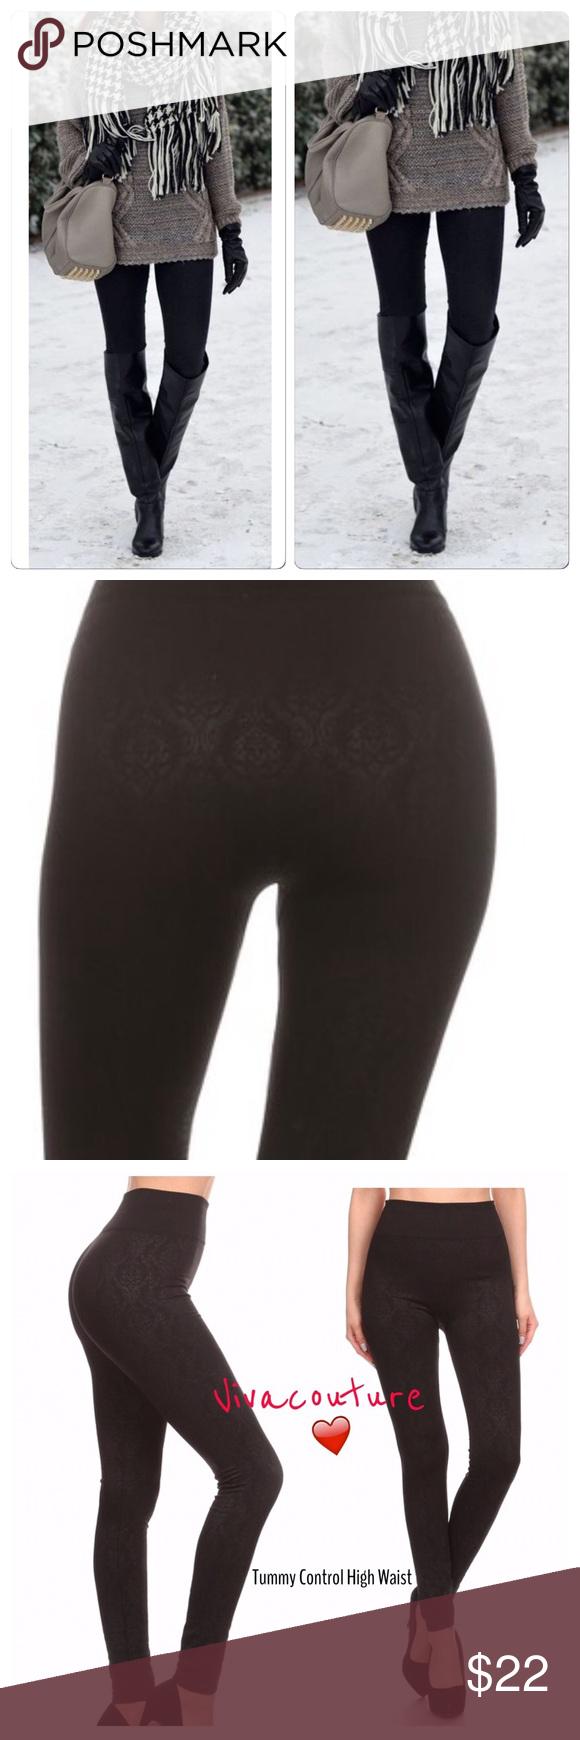 e03ff030034a3d New Black Fleece Lined Leggings Fleece lined textured damask print leggings  high waist nwt osfm will